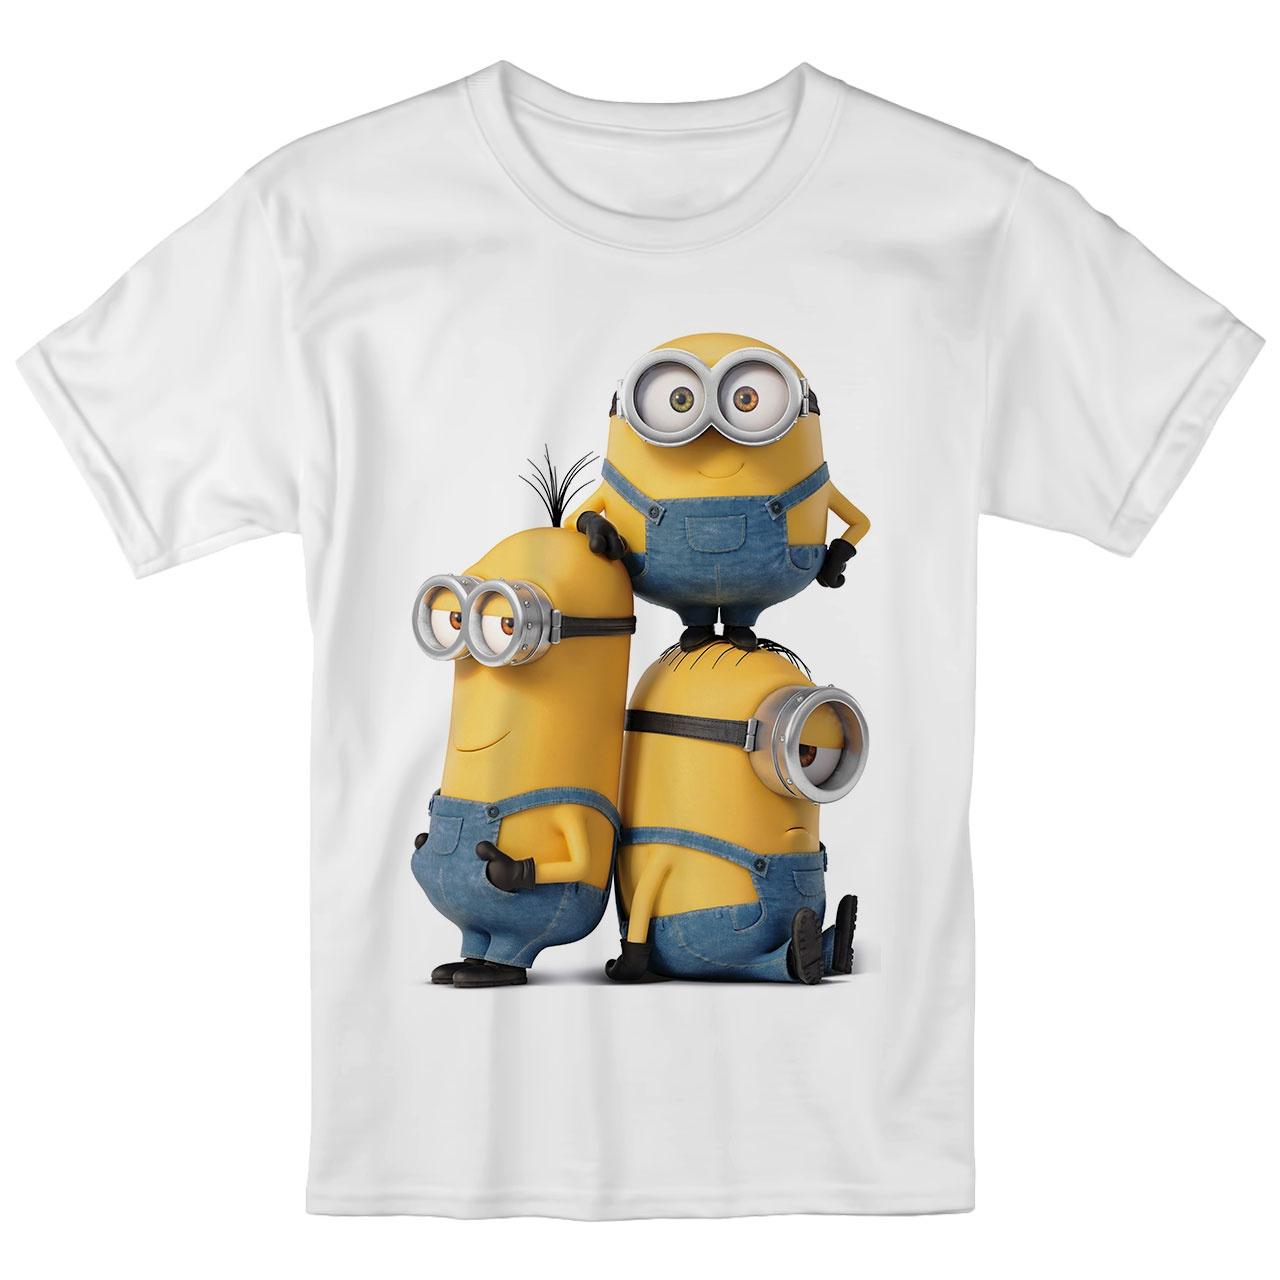 تصویر تی شرت بچگانه انارچاپ طرح مینیون ها مدل T09030